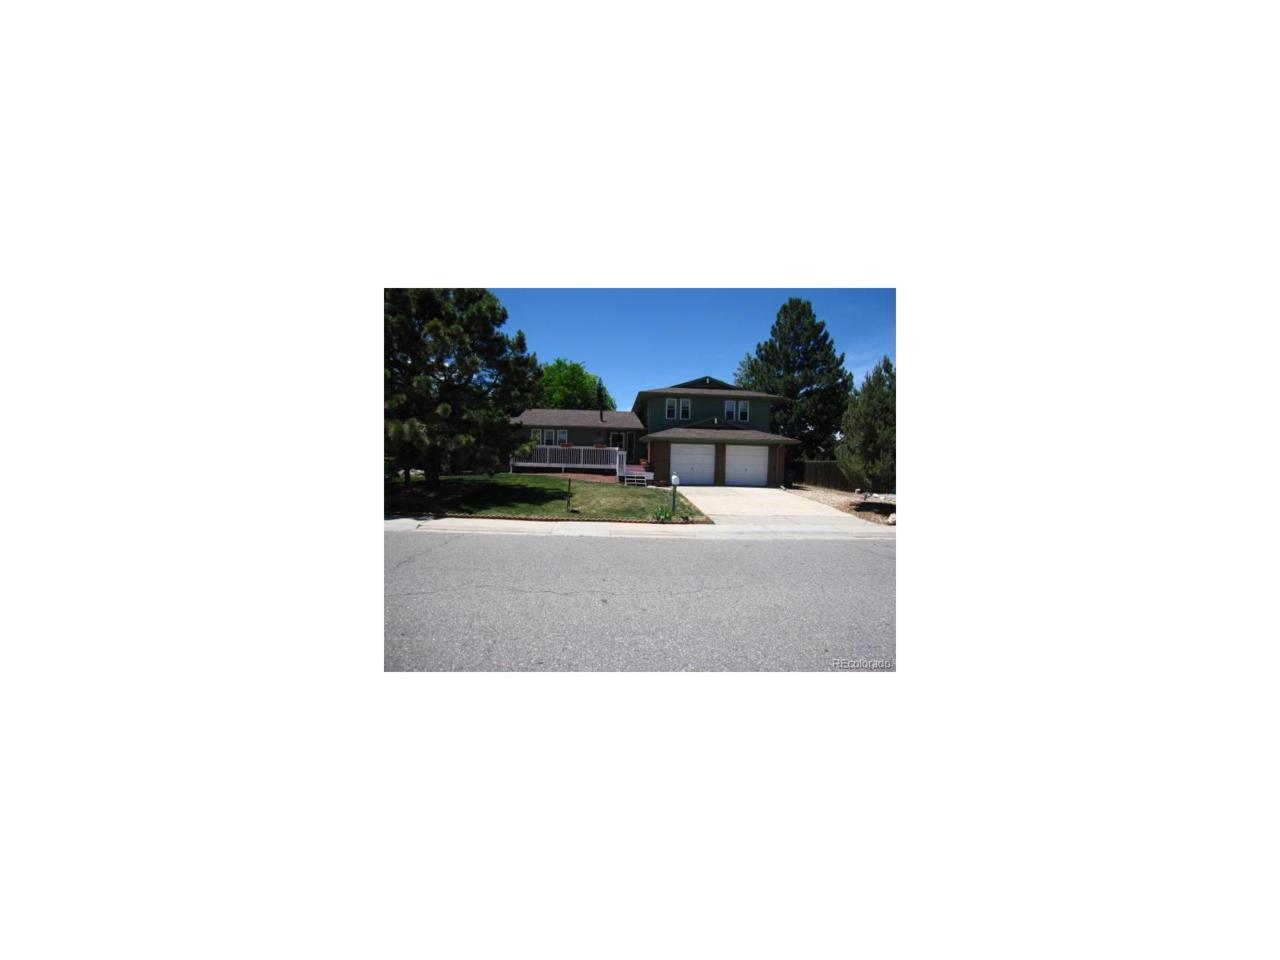 7373 S Franklin Street, Centennial, CO 80122 (MLS #9737561) :: 8z Real Estate